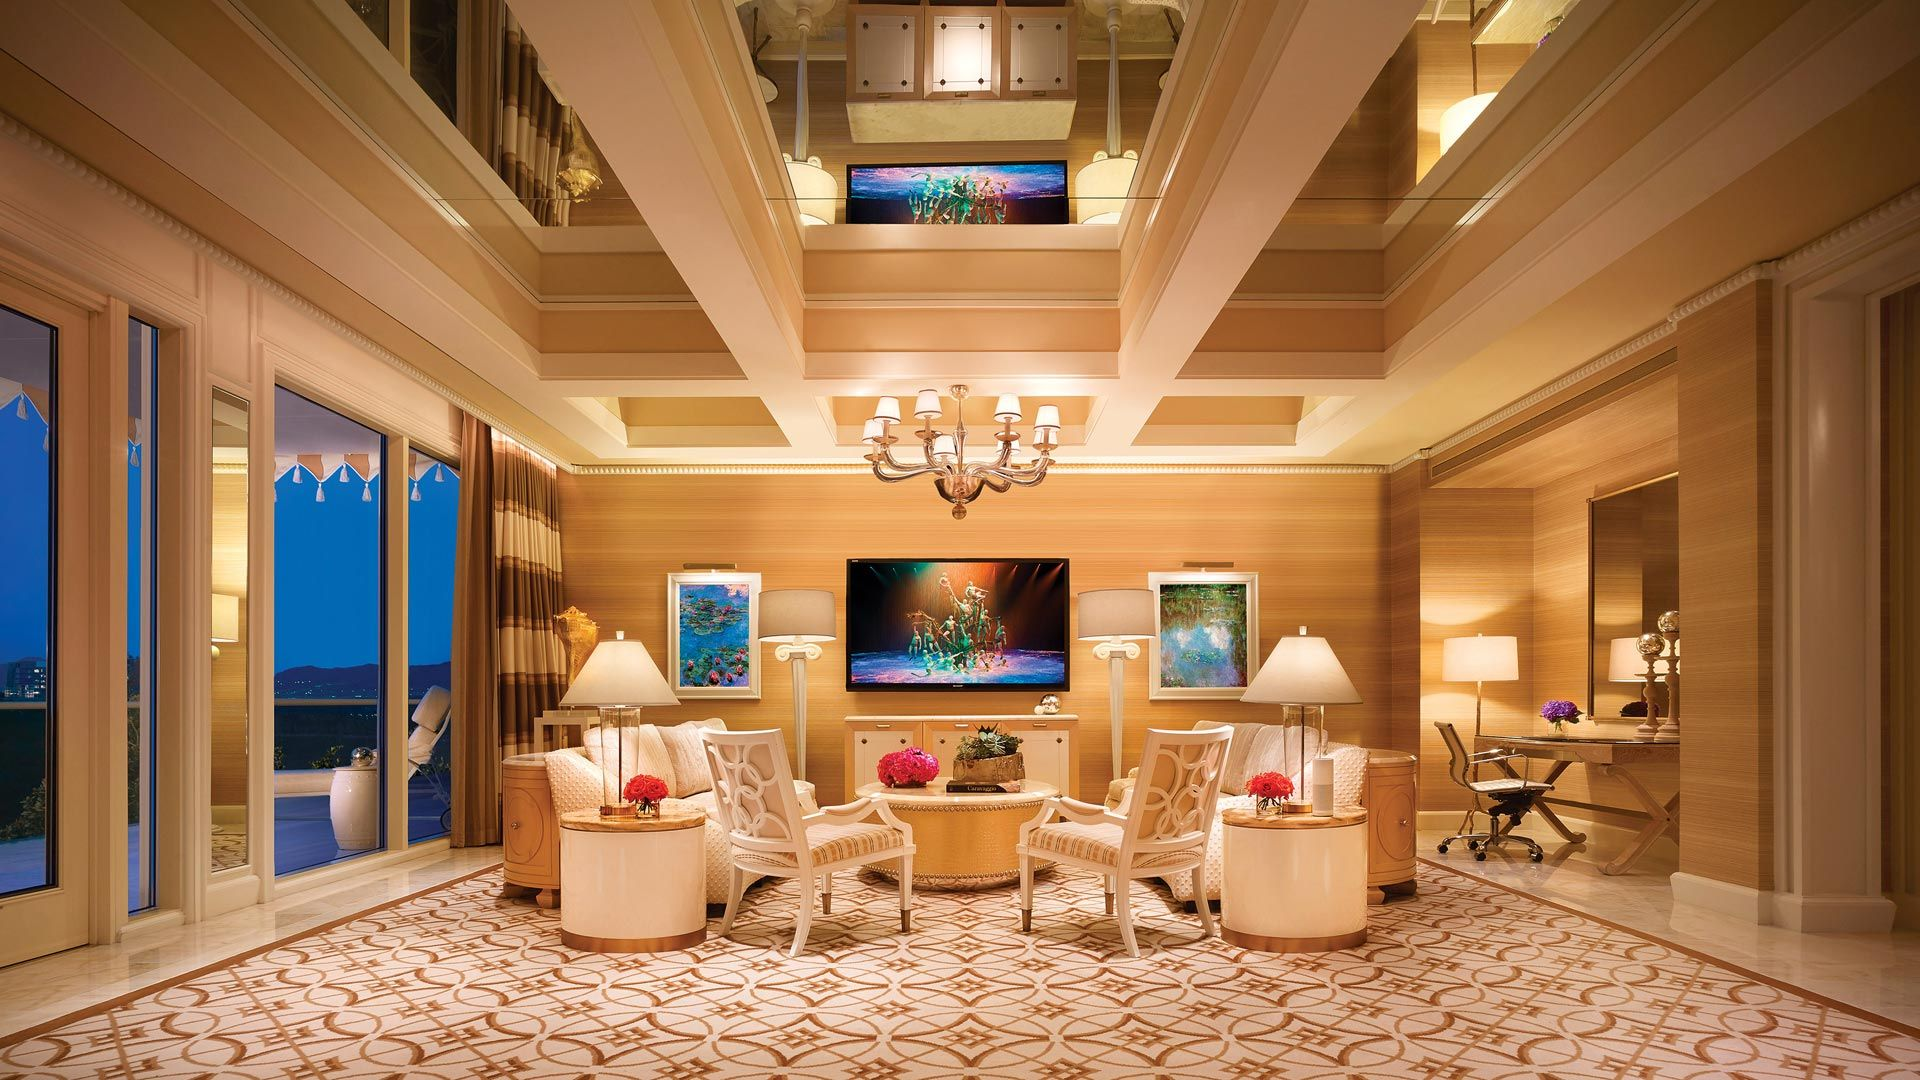 Wynn Fairway Villa Las Vegas Luxury Hotels Luxury Hotel Room